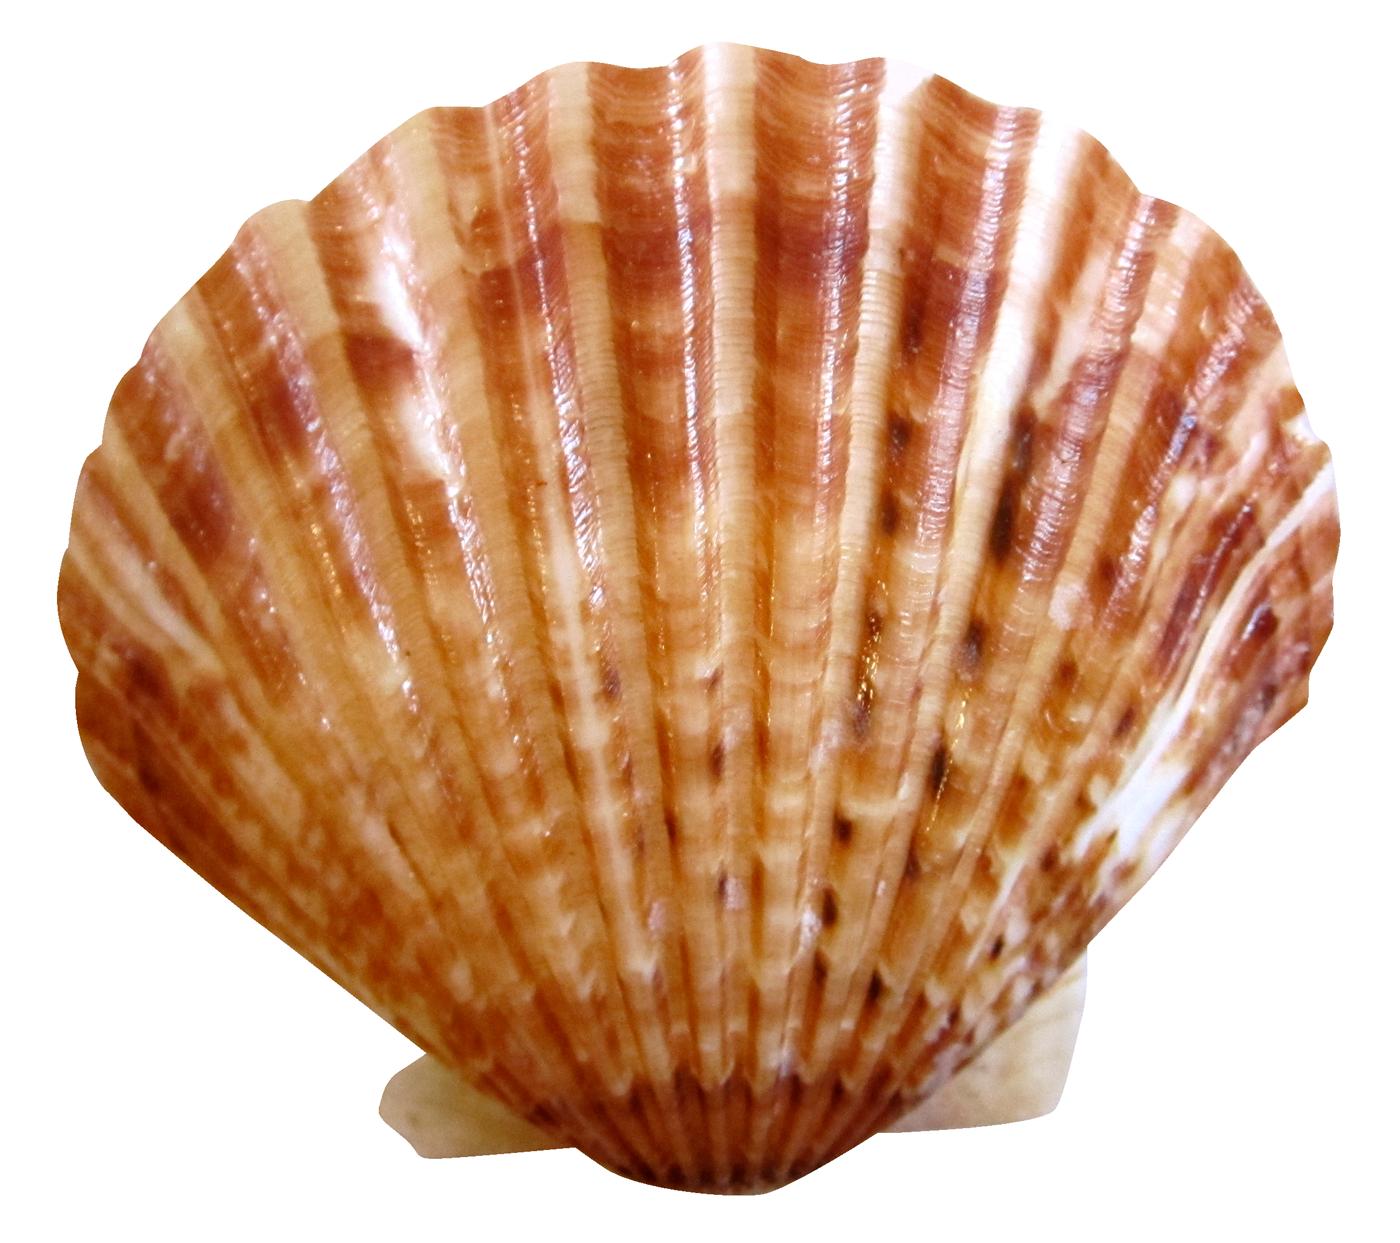 Sea Ocean Shell PNG Image.